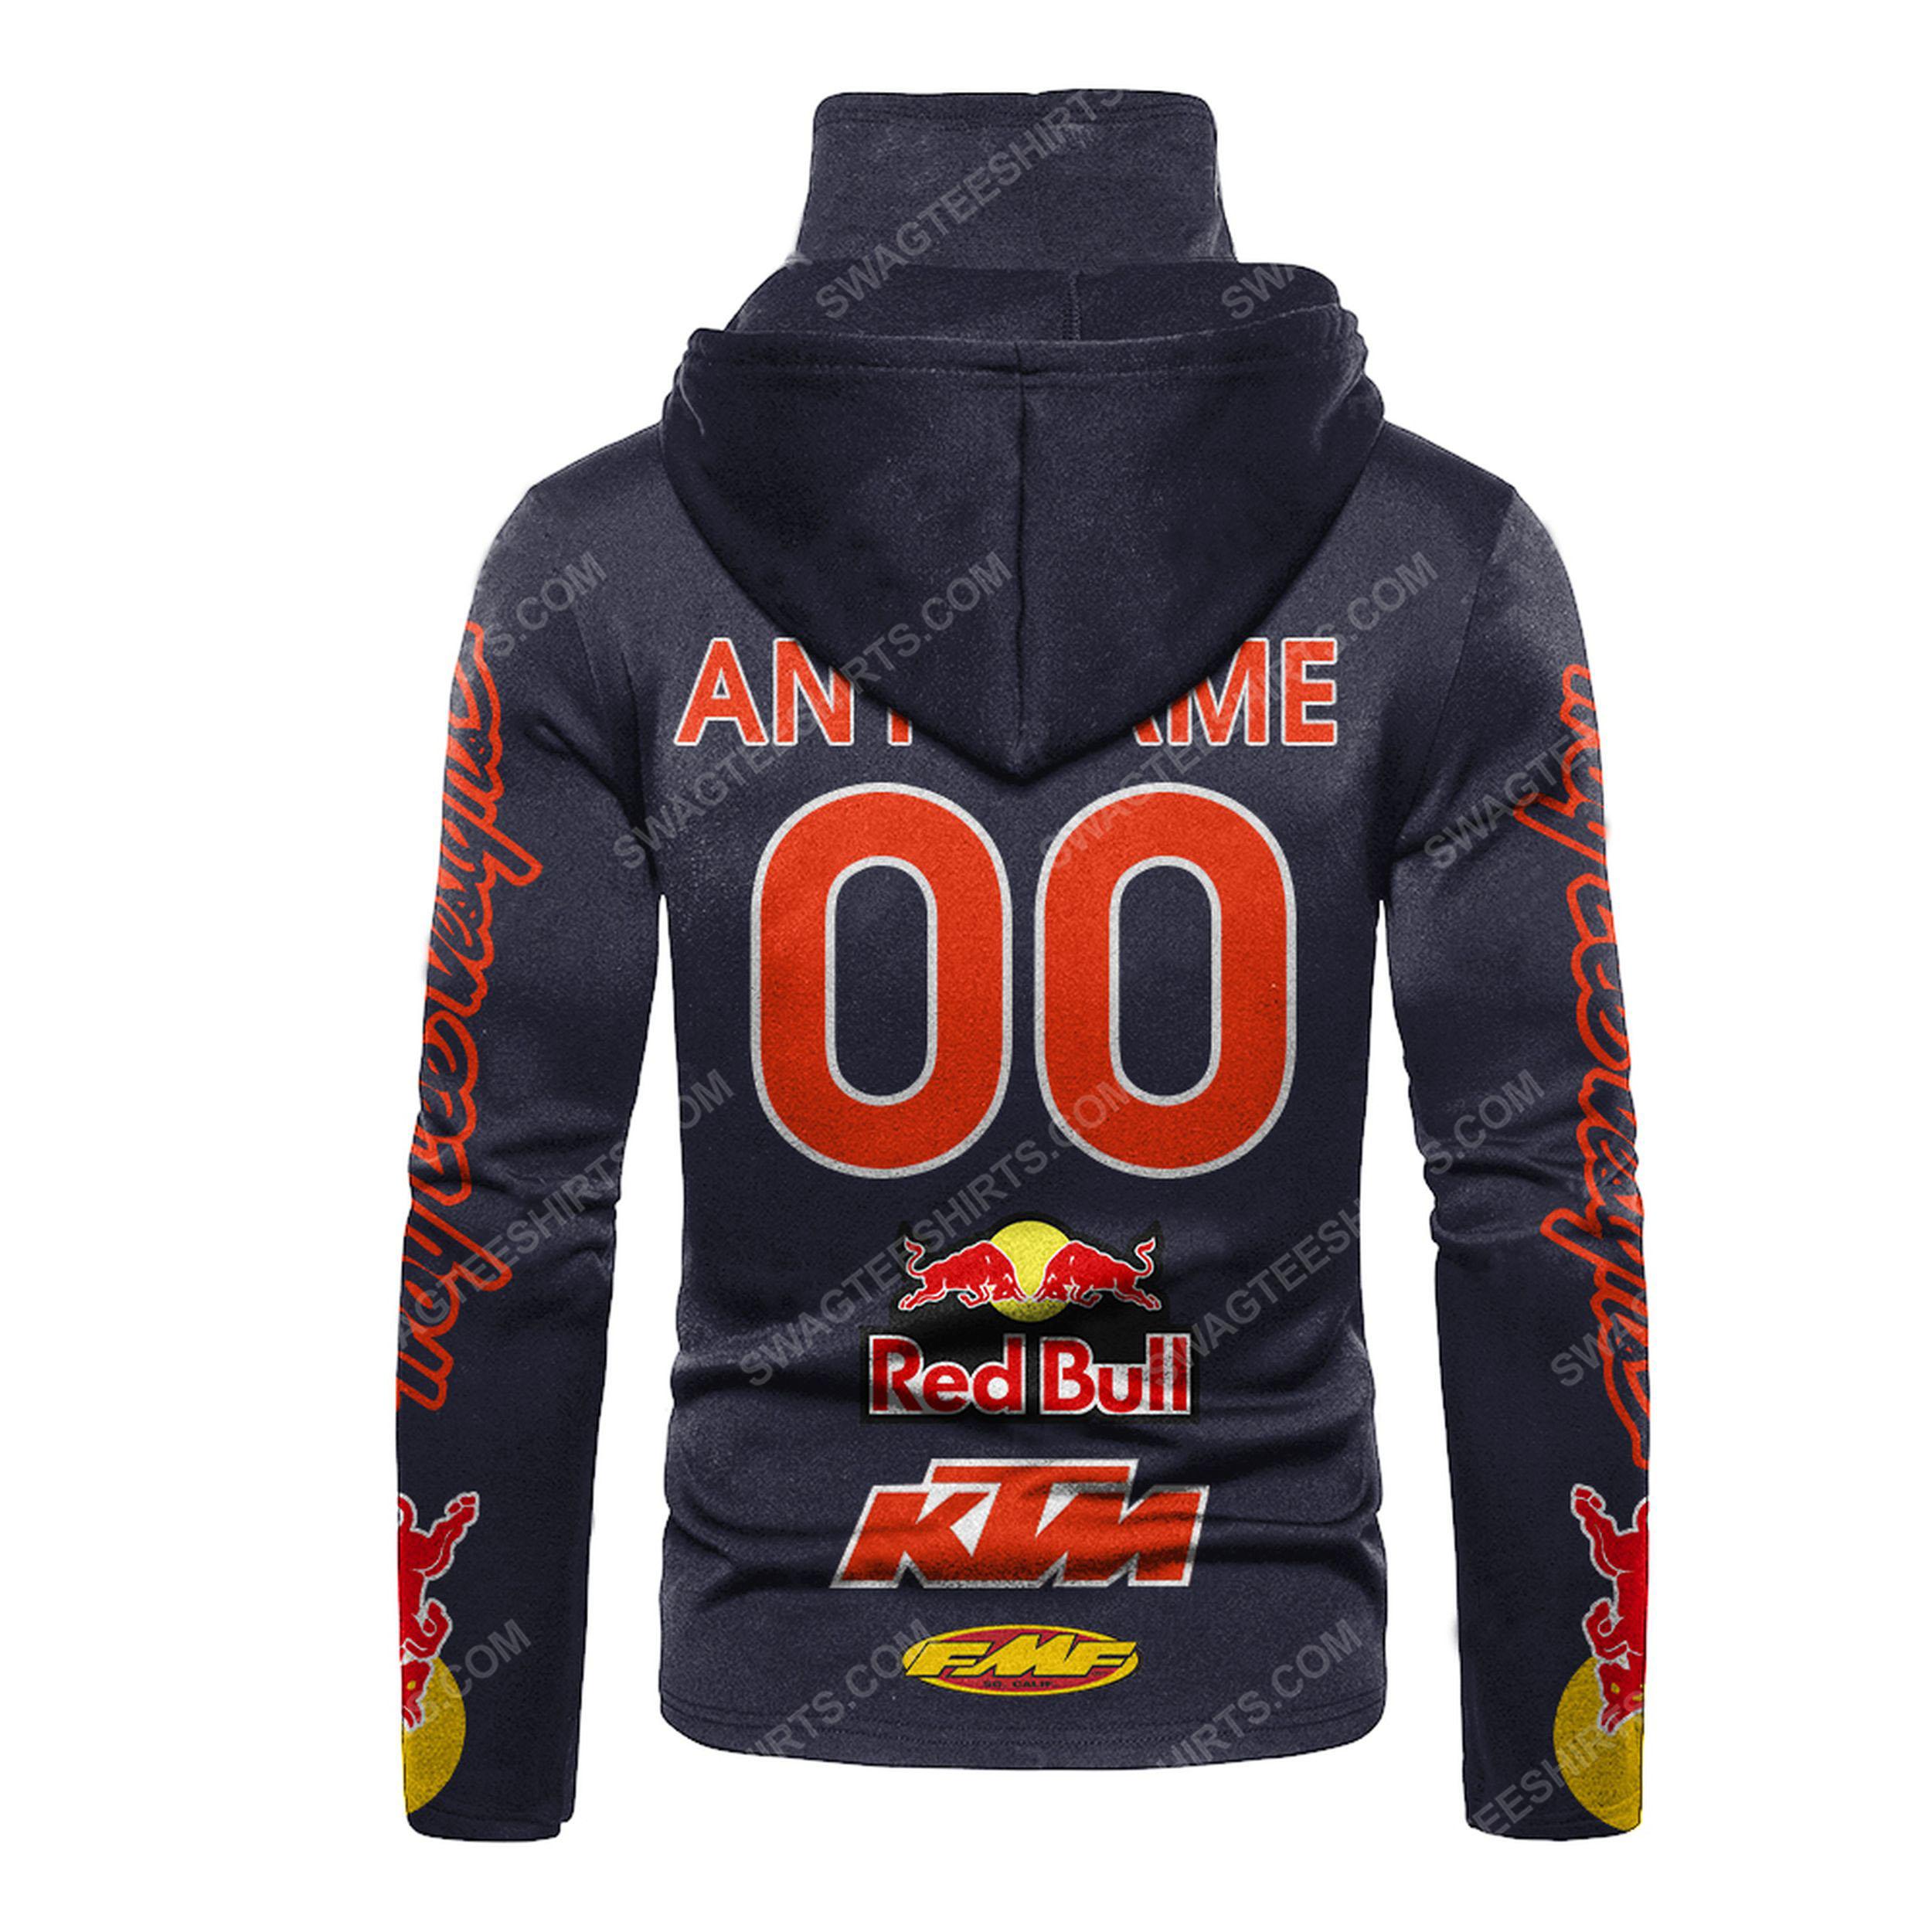 Custom name red bull ktm factory racing full print mask hoodie 3(1)